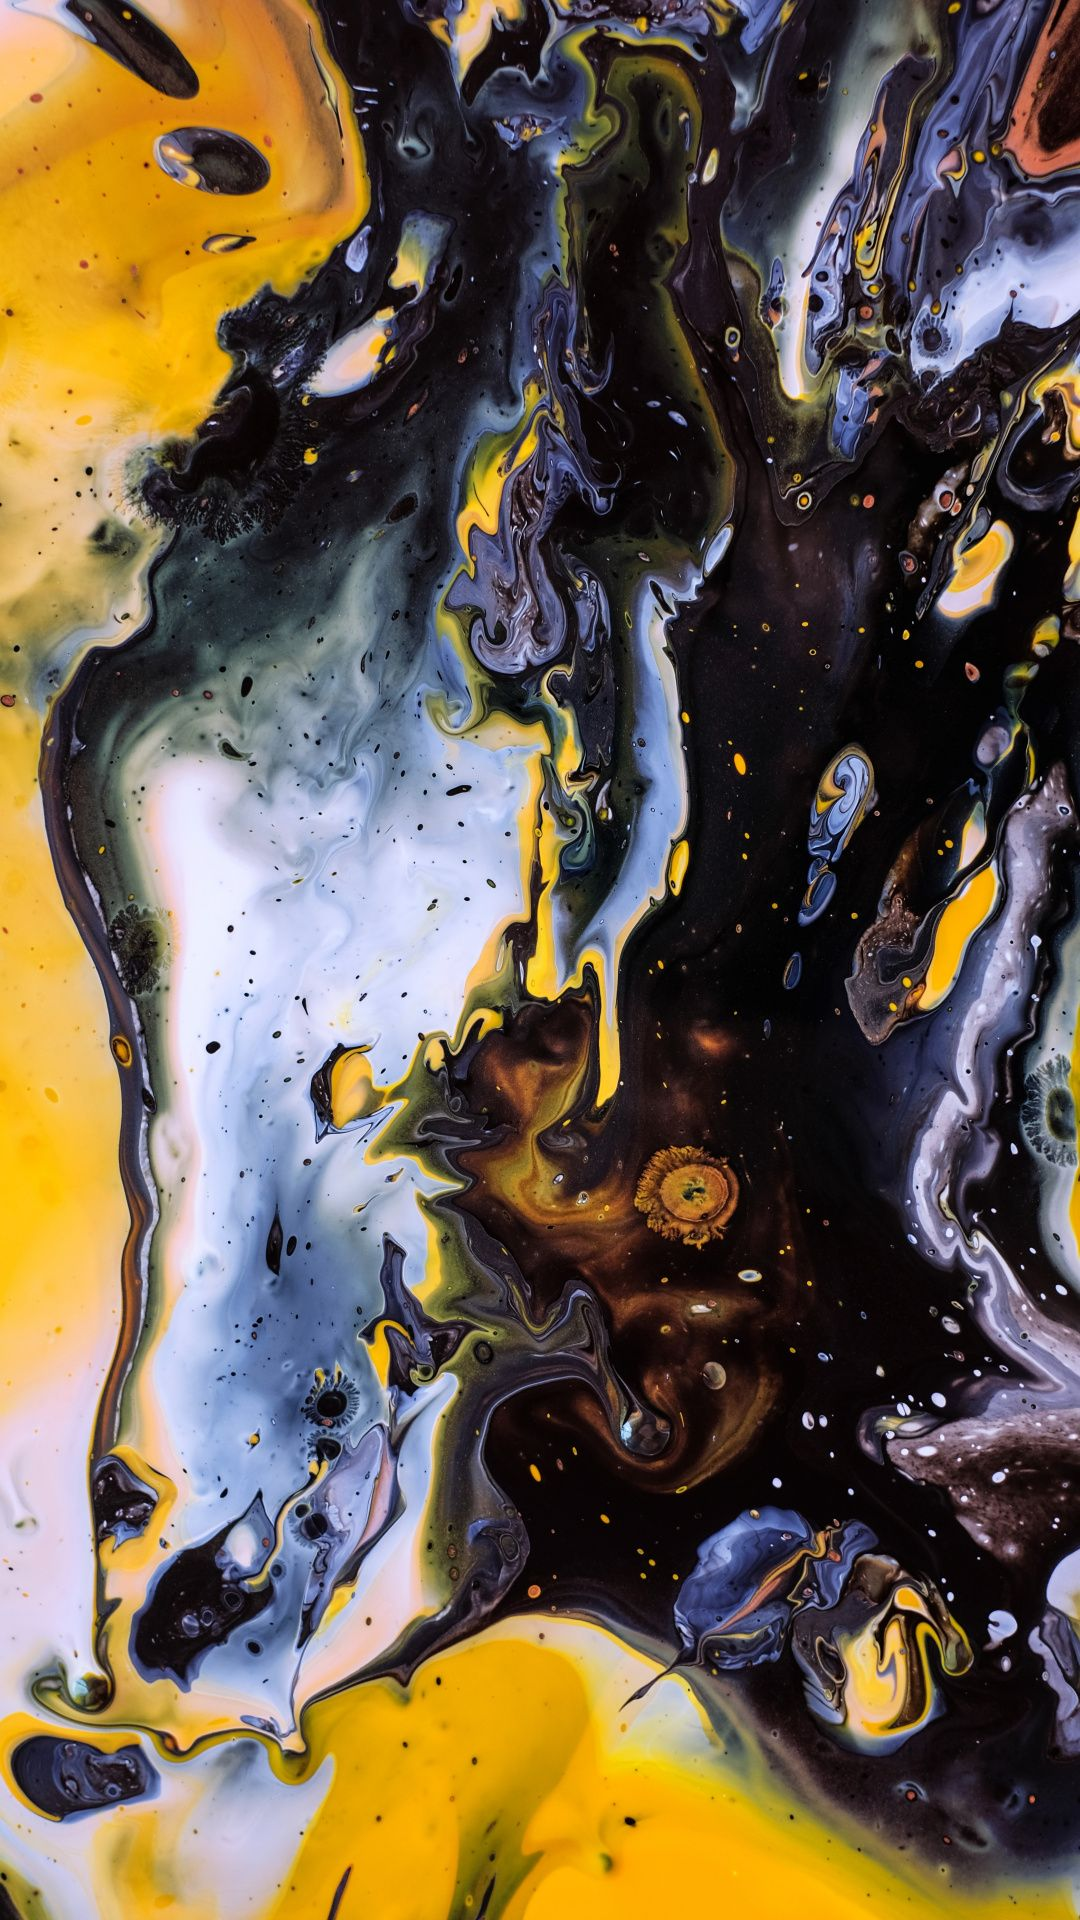 1080x1920 Blueyellow, dark, art, texture wallpaper